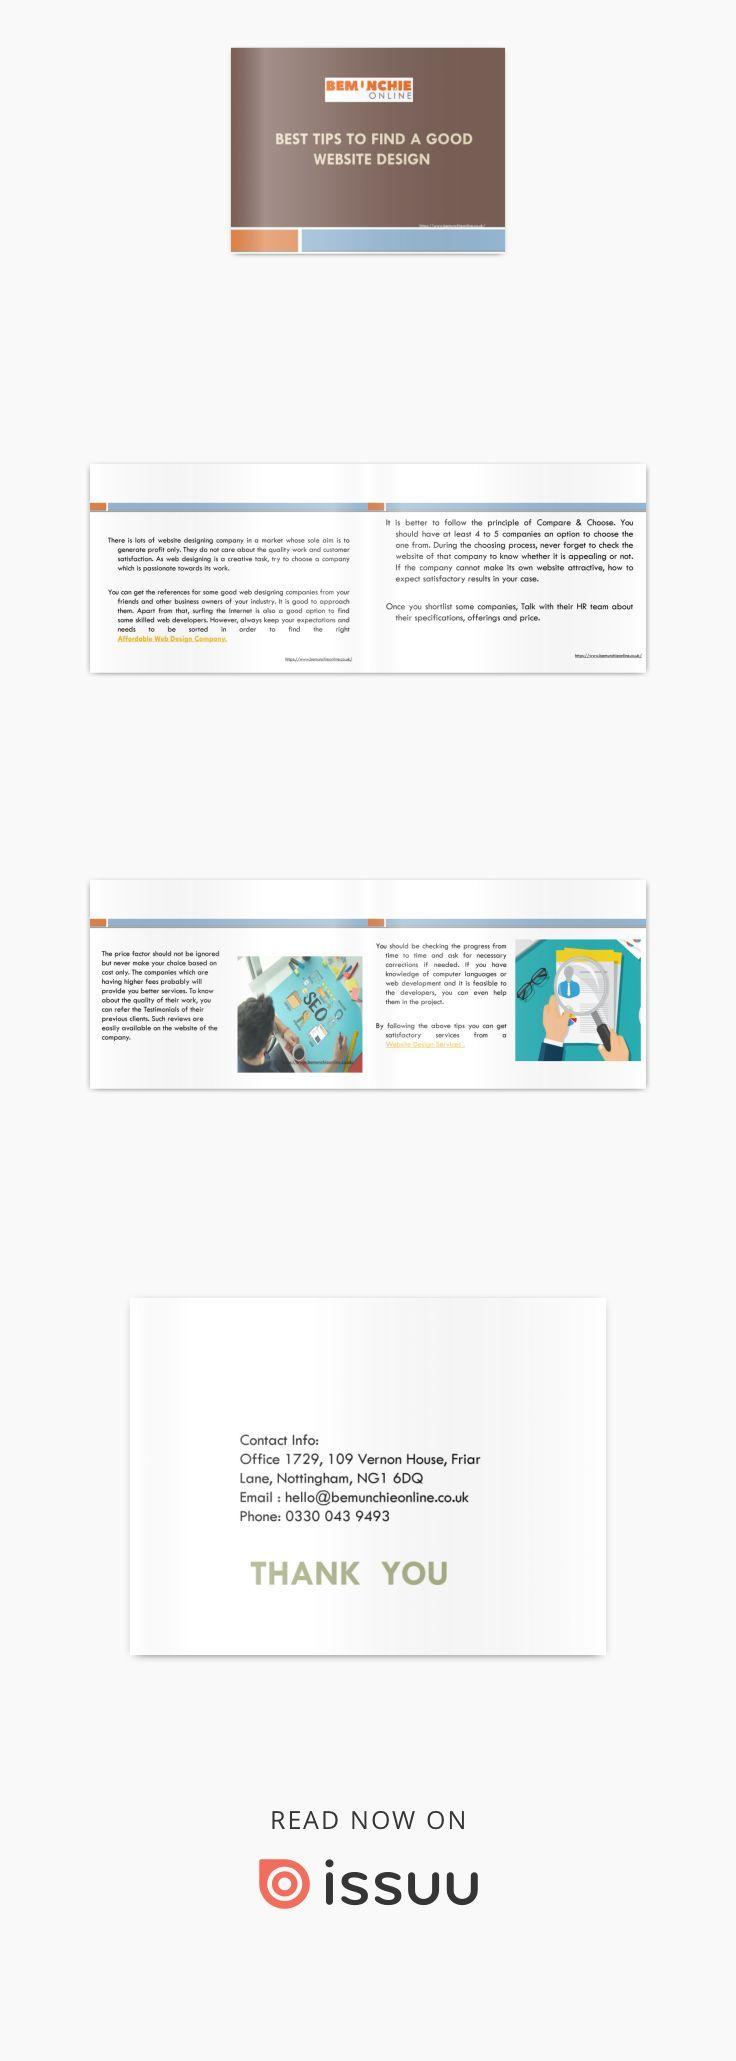 Cheap Web Design Services Cheap Web Design Web Design Fun Website Design